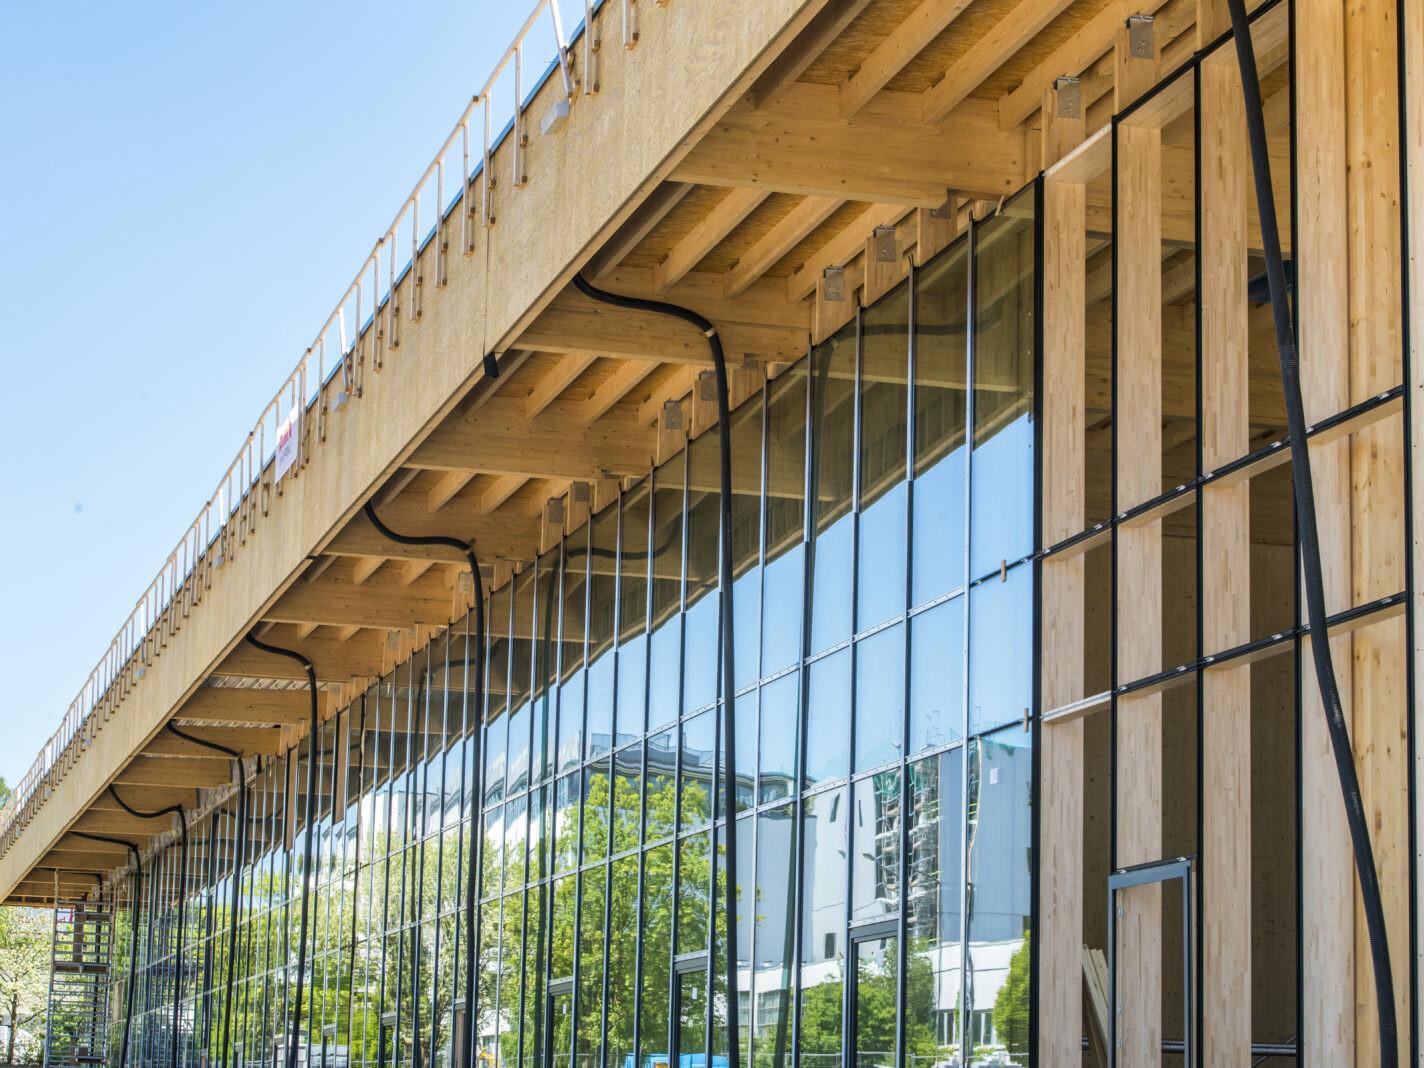 Jowat Detmold Holzbau Industrie_brandschutz plus eberl-pacan brandschutzplaner_Pfosten-Riegel-Konstruktoion Fassade (c)Züblin Timber(1)